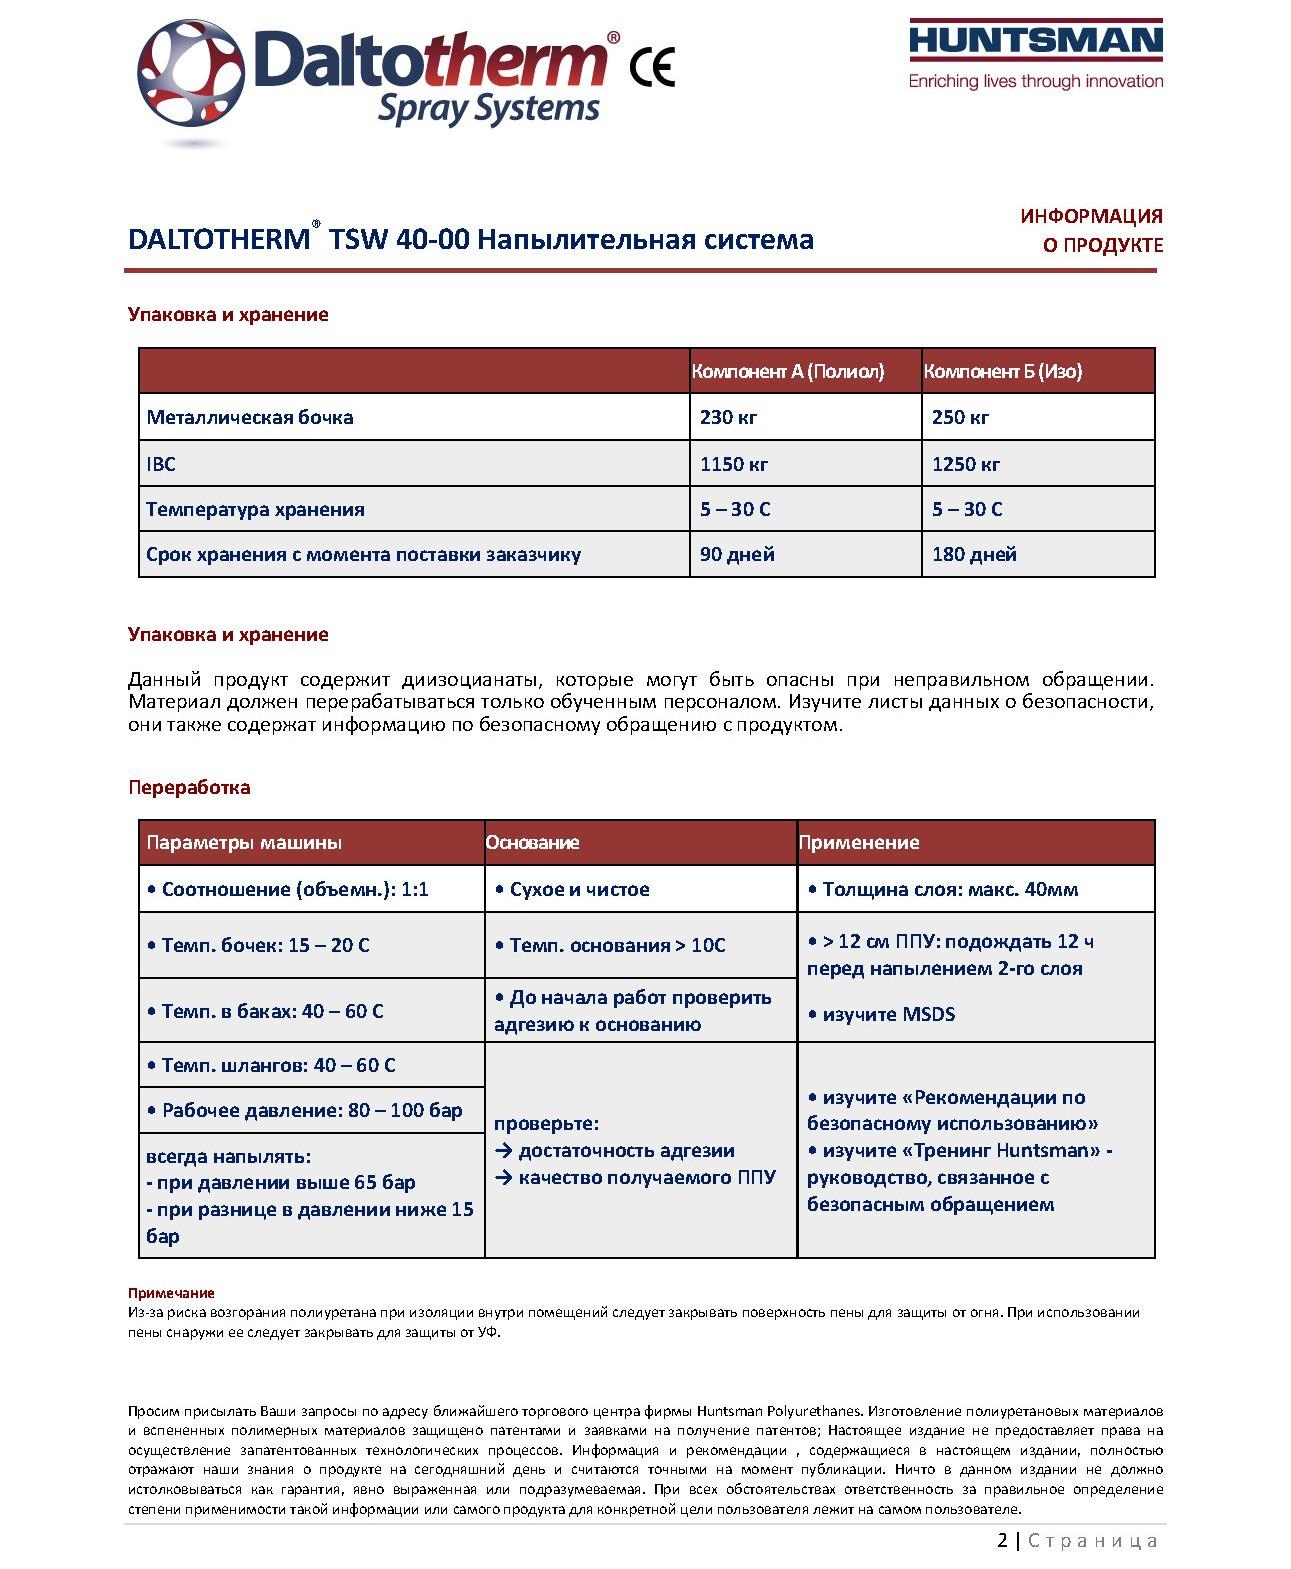 Daltotherm_TSW_40-00 компоненты Huntsman NMG Ханстман_Страница_2